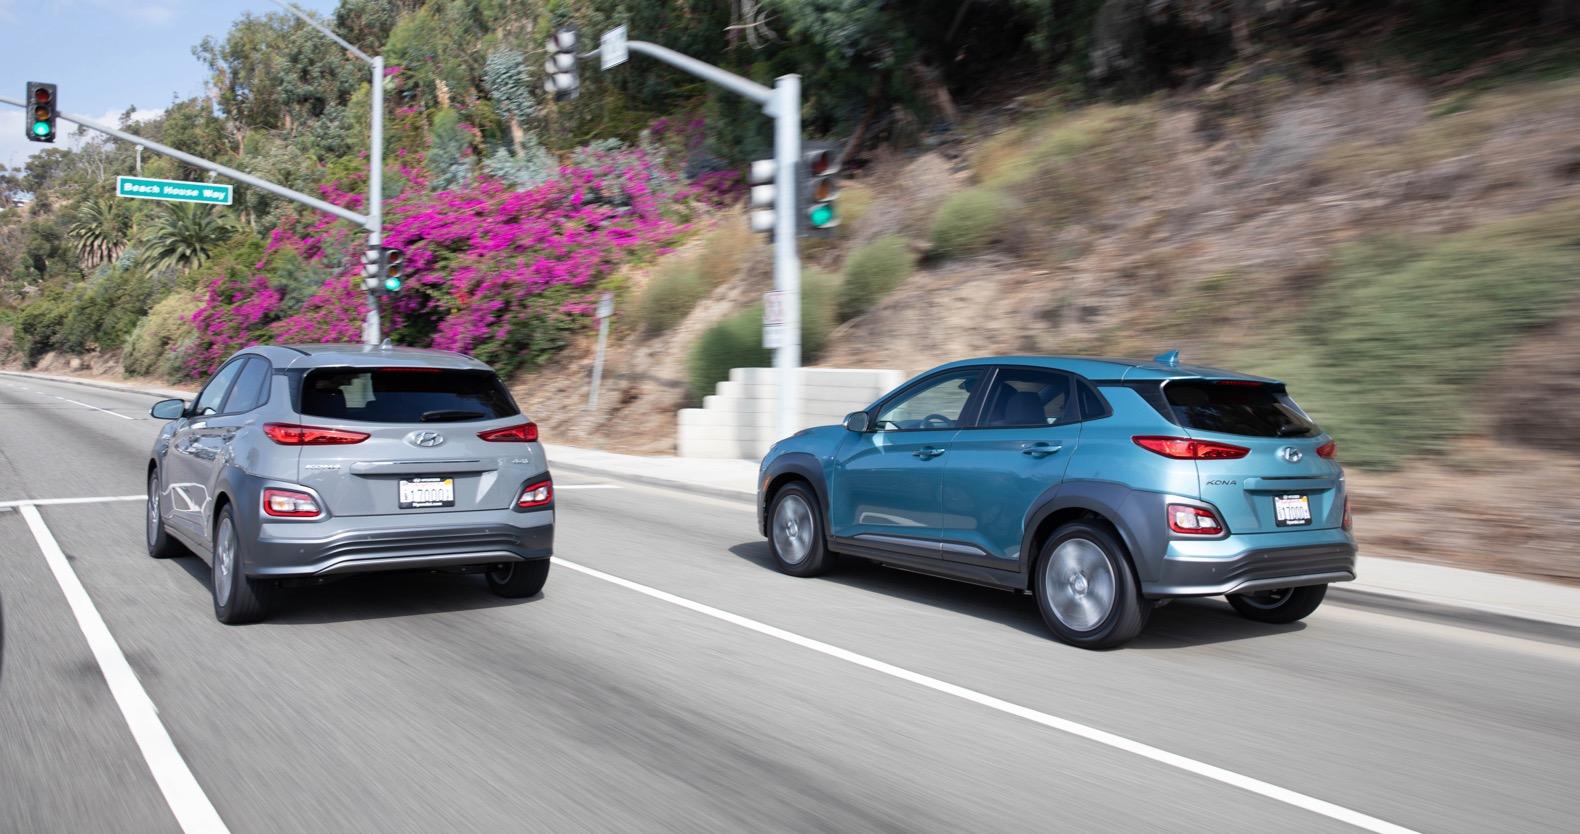 2020 Hyundai Kona Electric Gets A Larger Nav And Battery